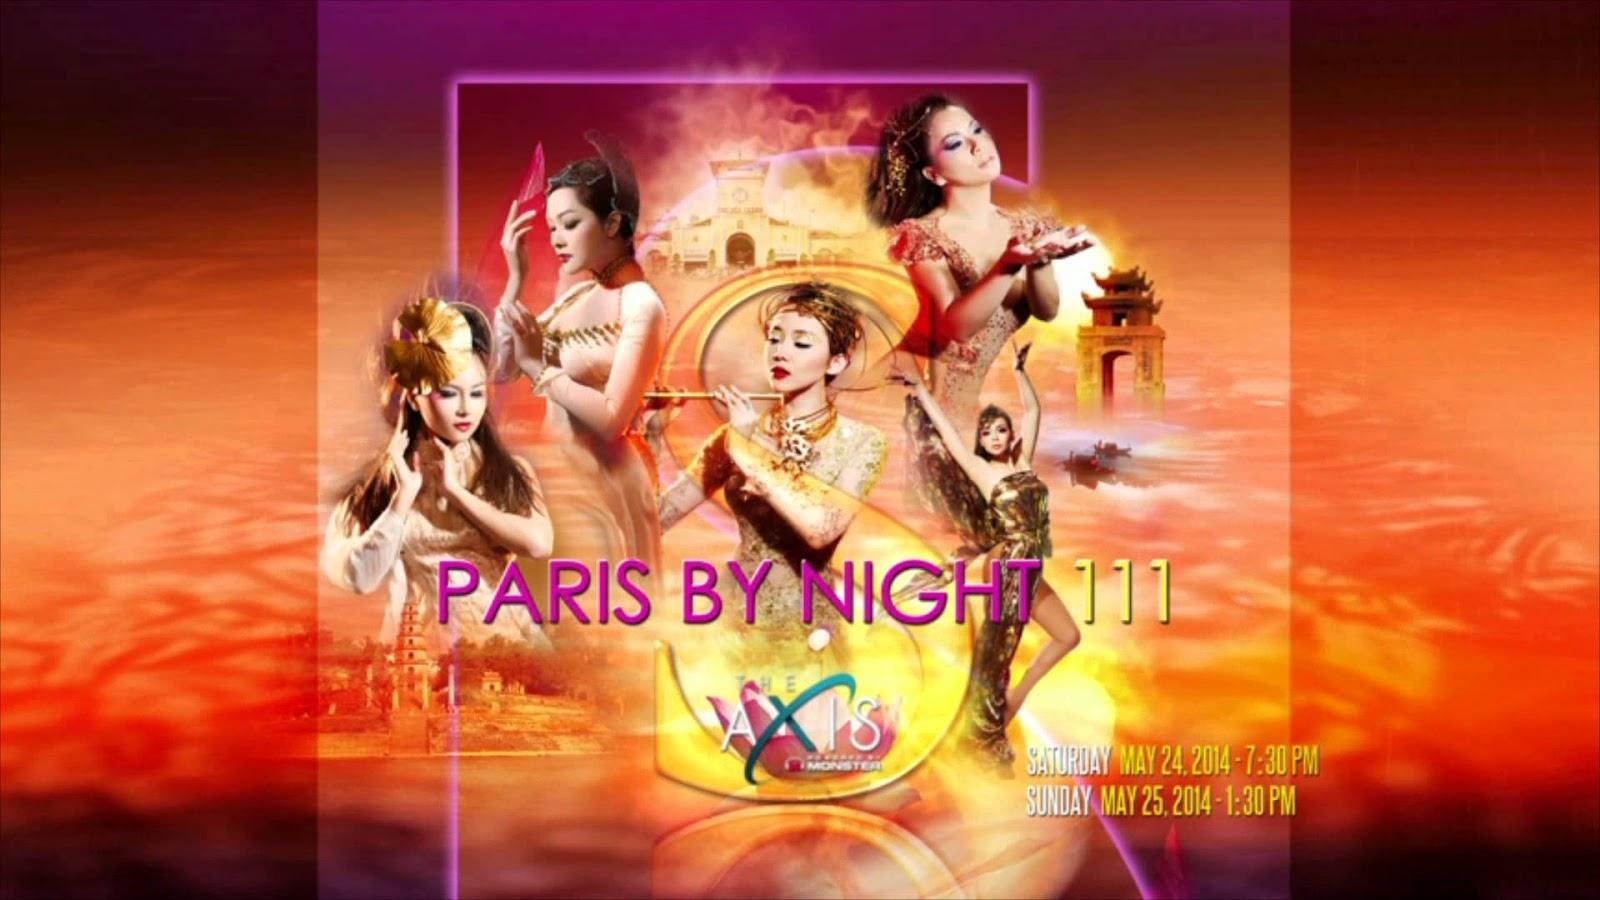 1 night in paris dvd: